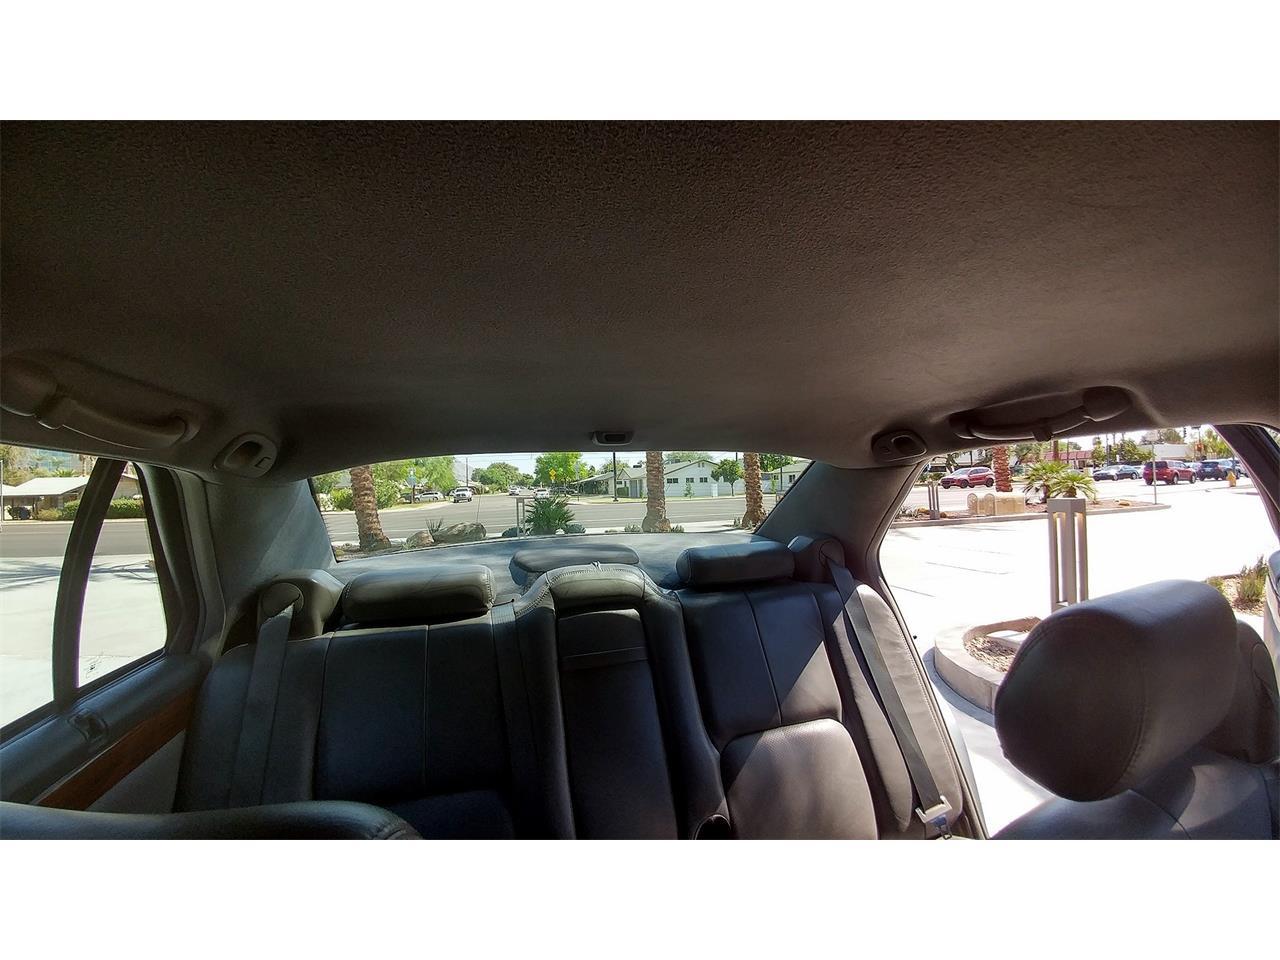 2002 Cadillac Seville (CC-1415653) for sale in Phoenix, Arizona